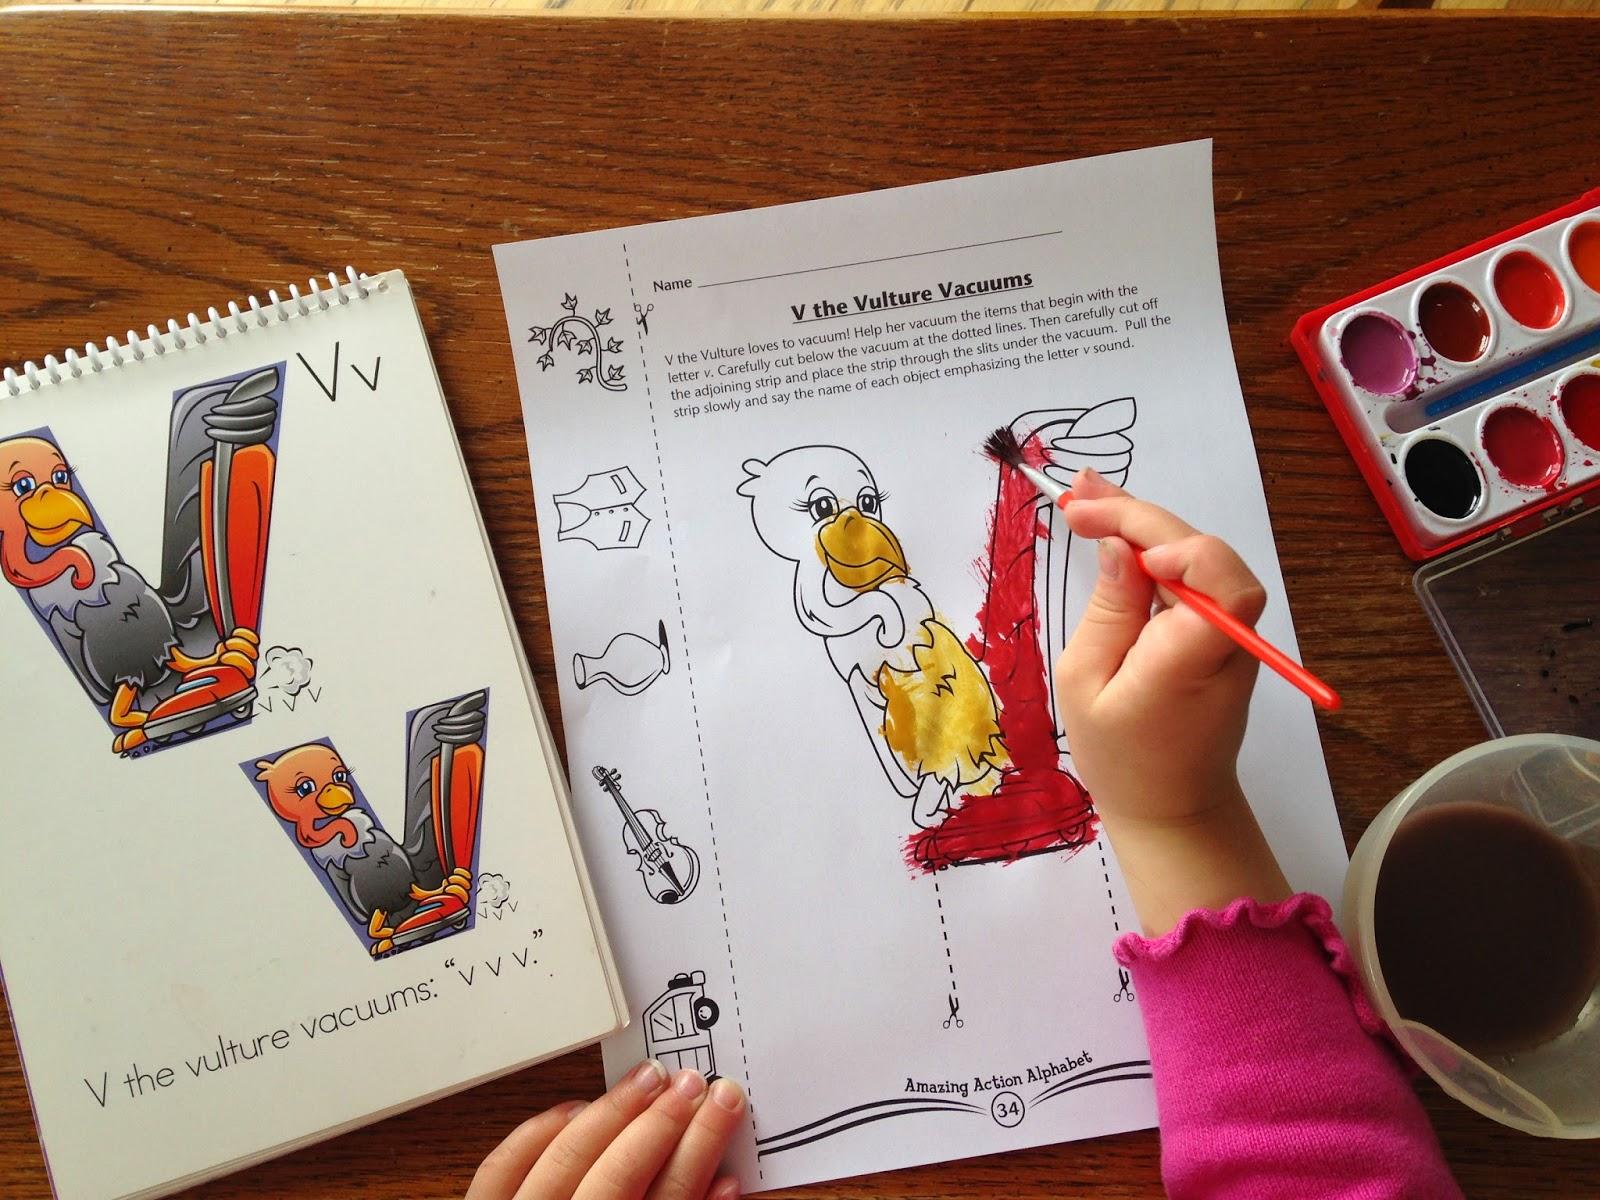 Letter V day with V the Vulture